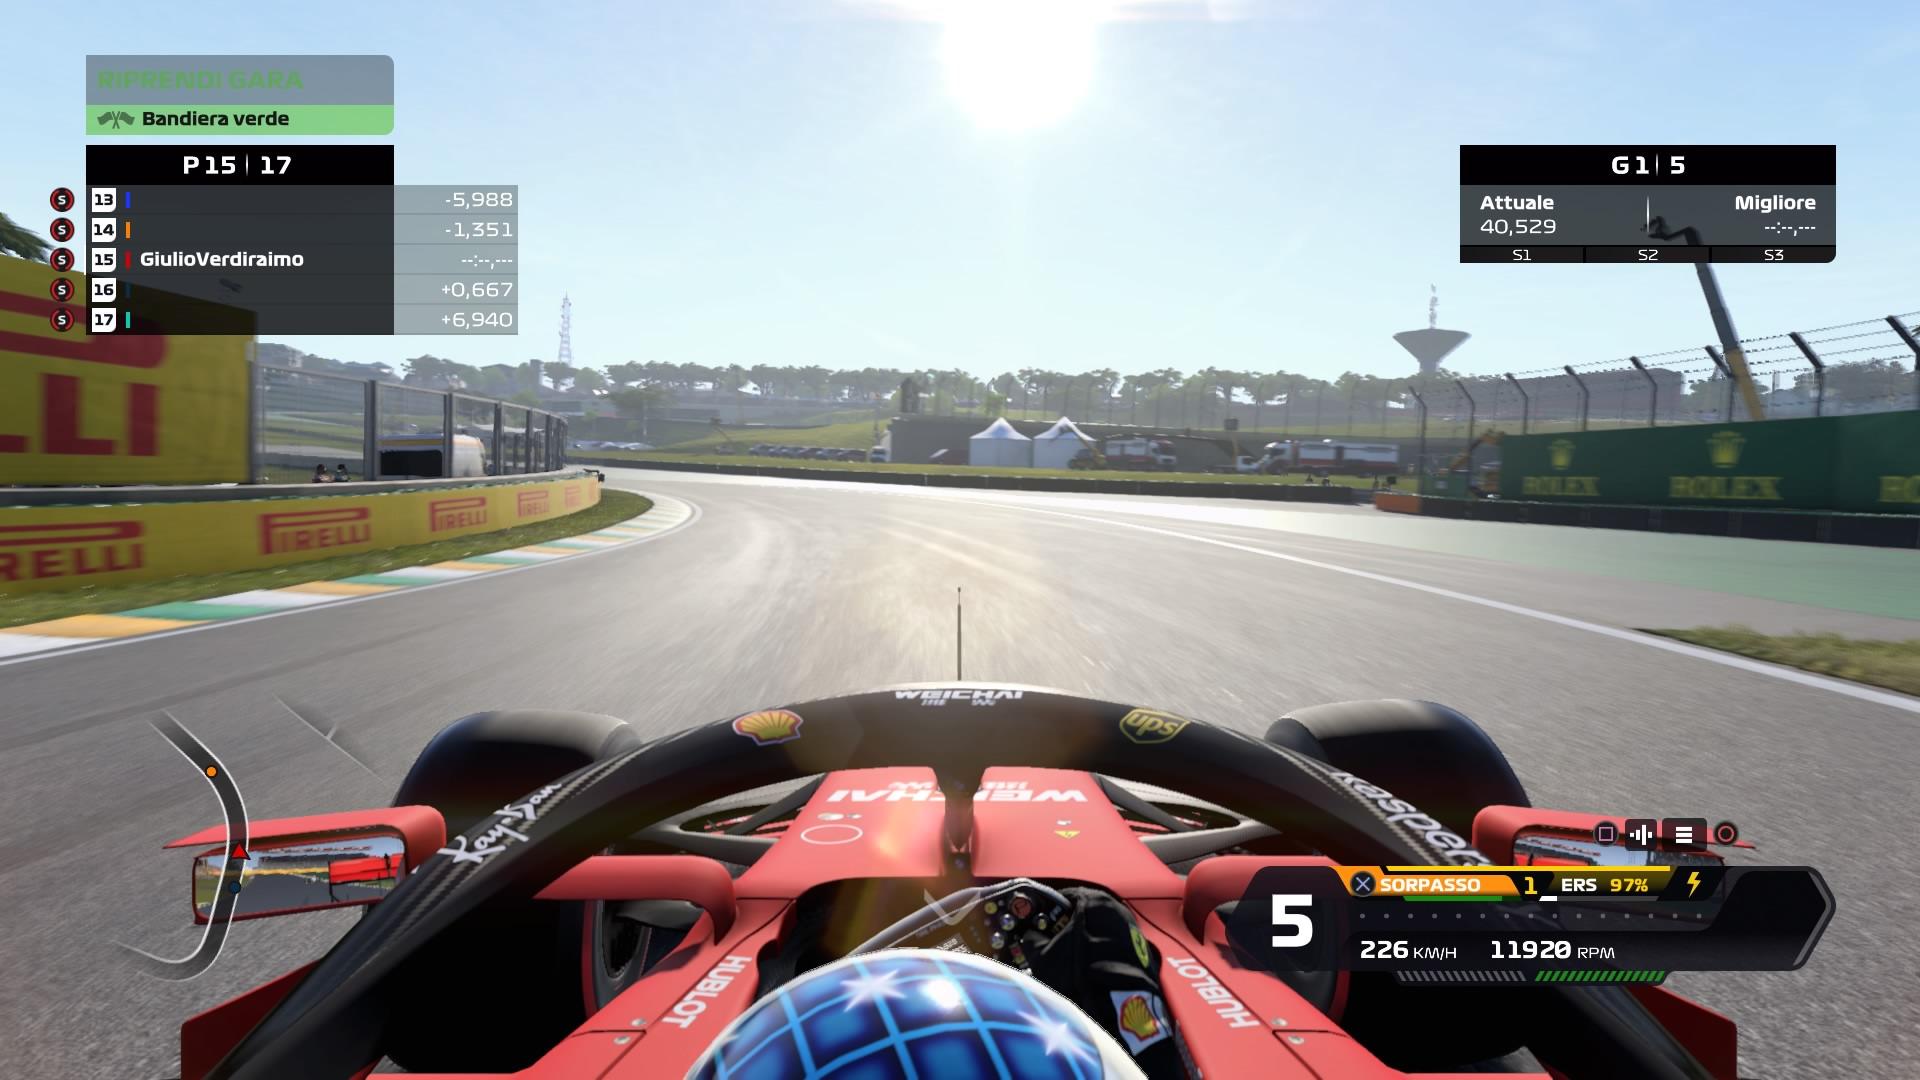 F1 2020 lobby online